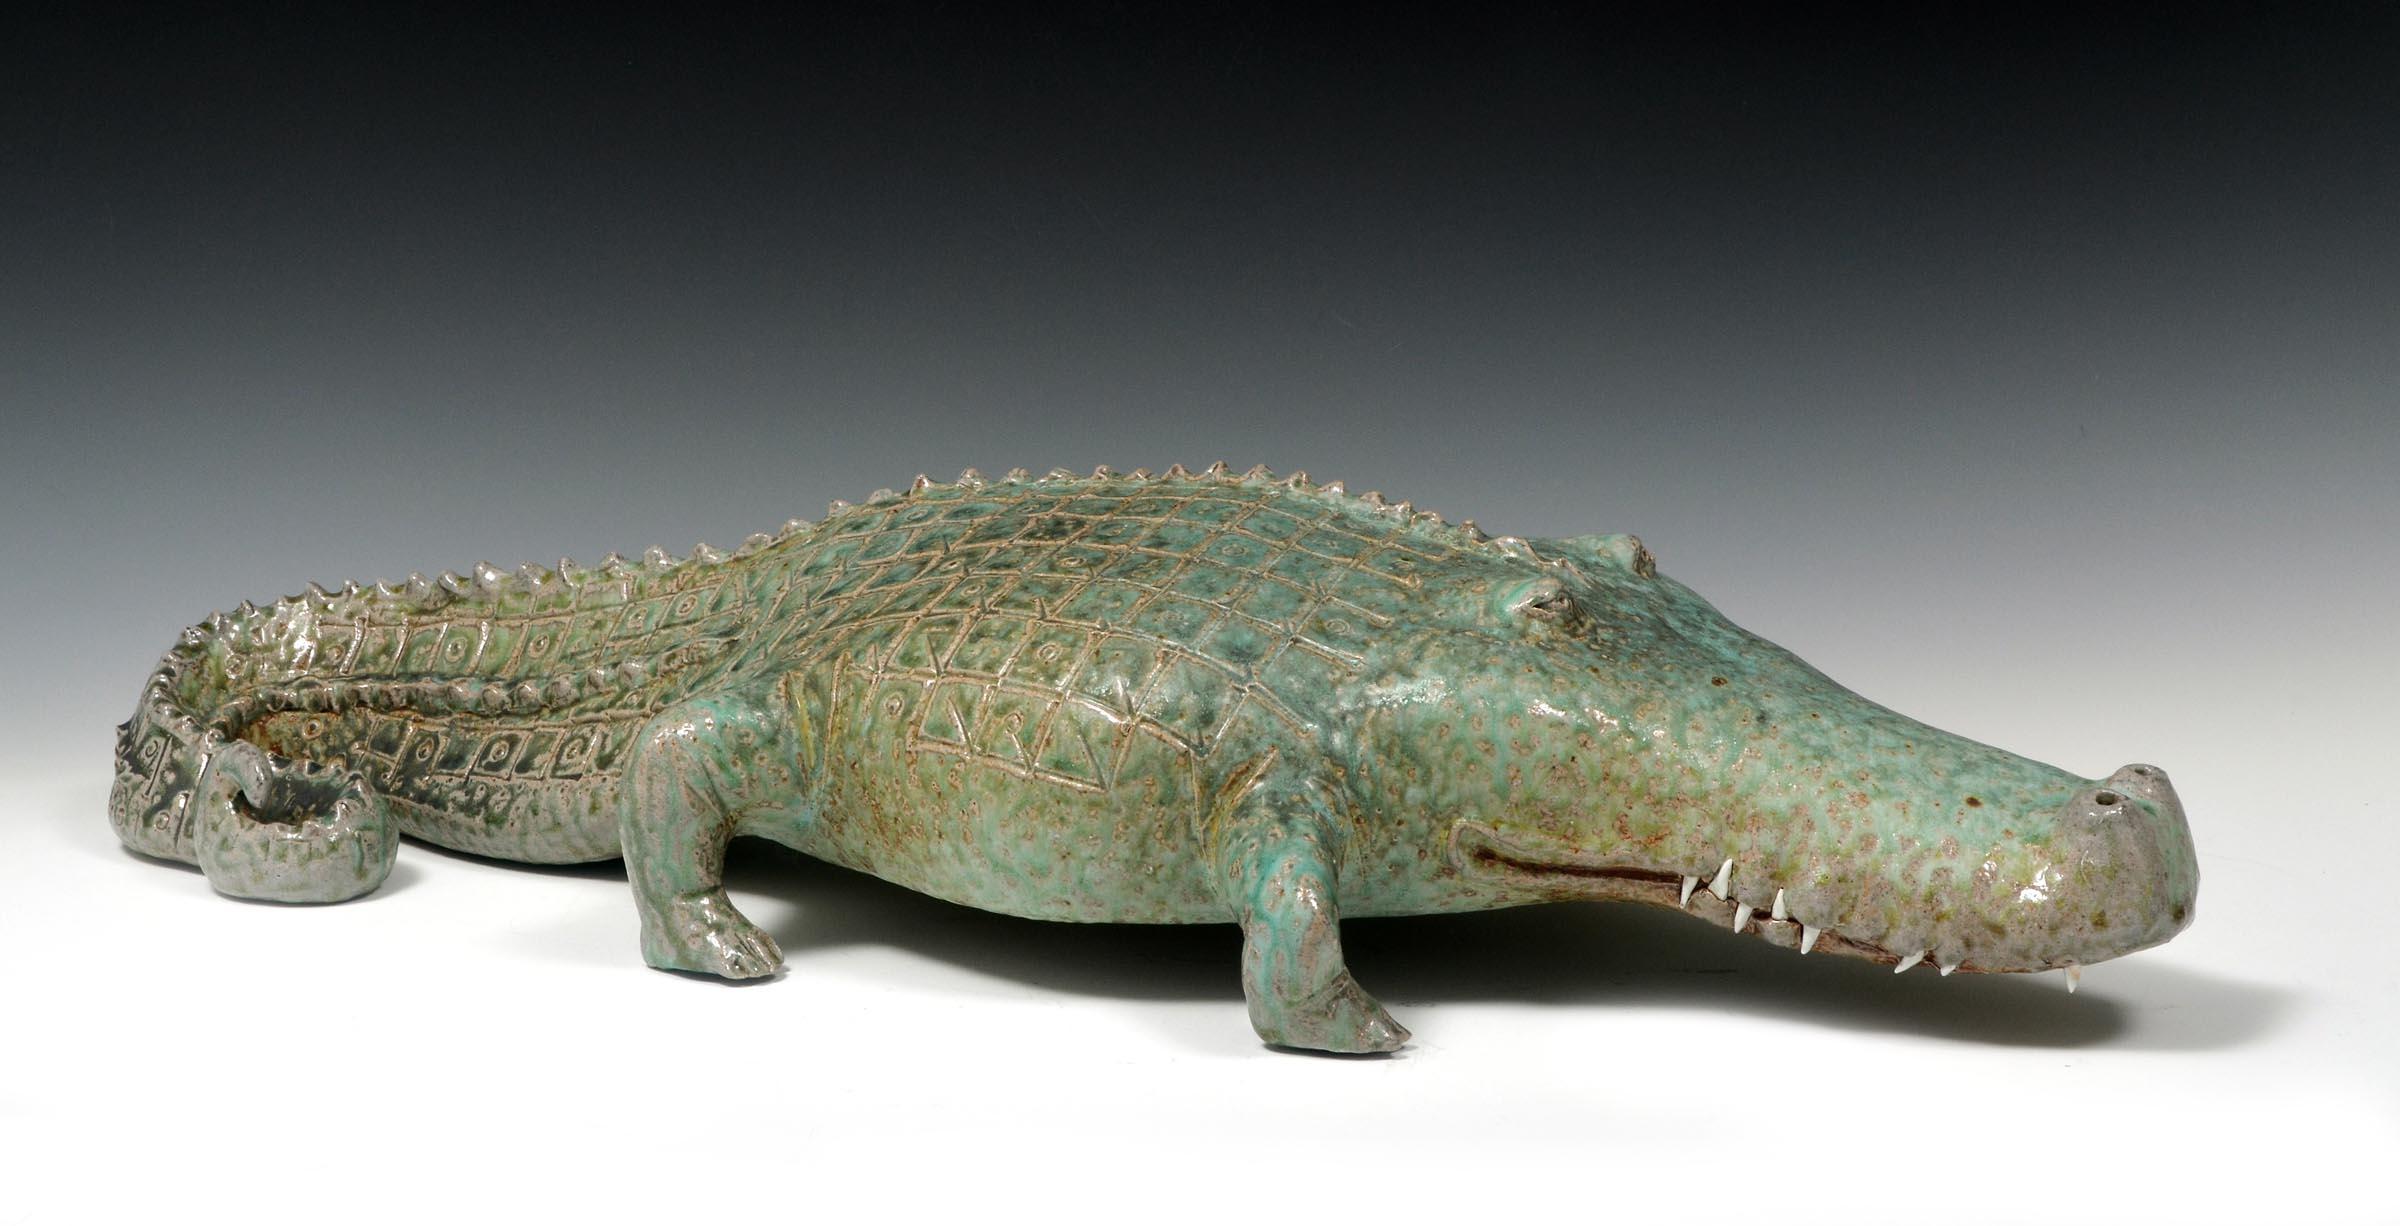 crocodile_1 copy.jpg